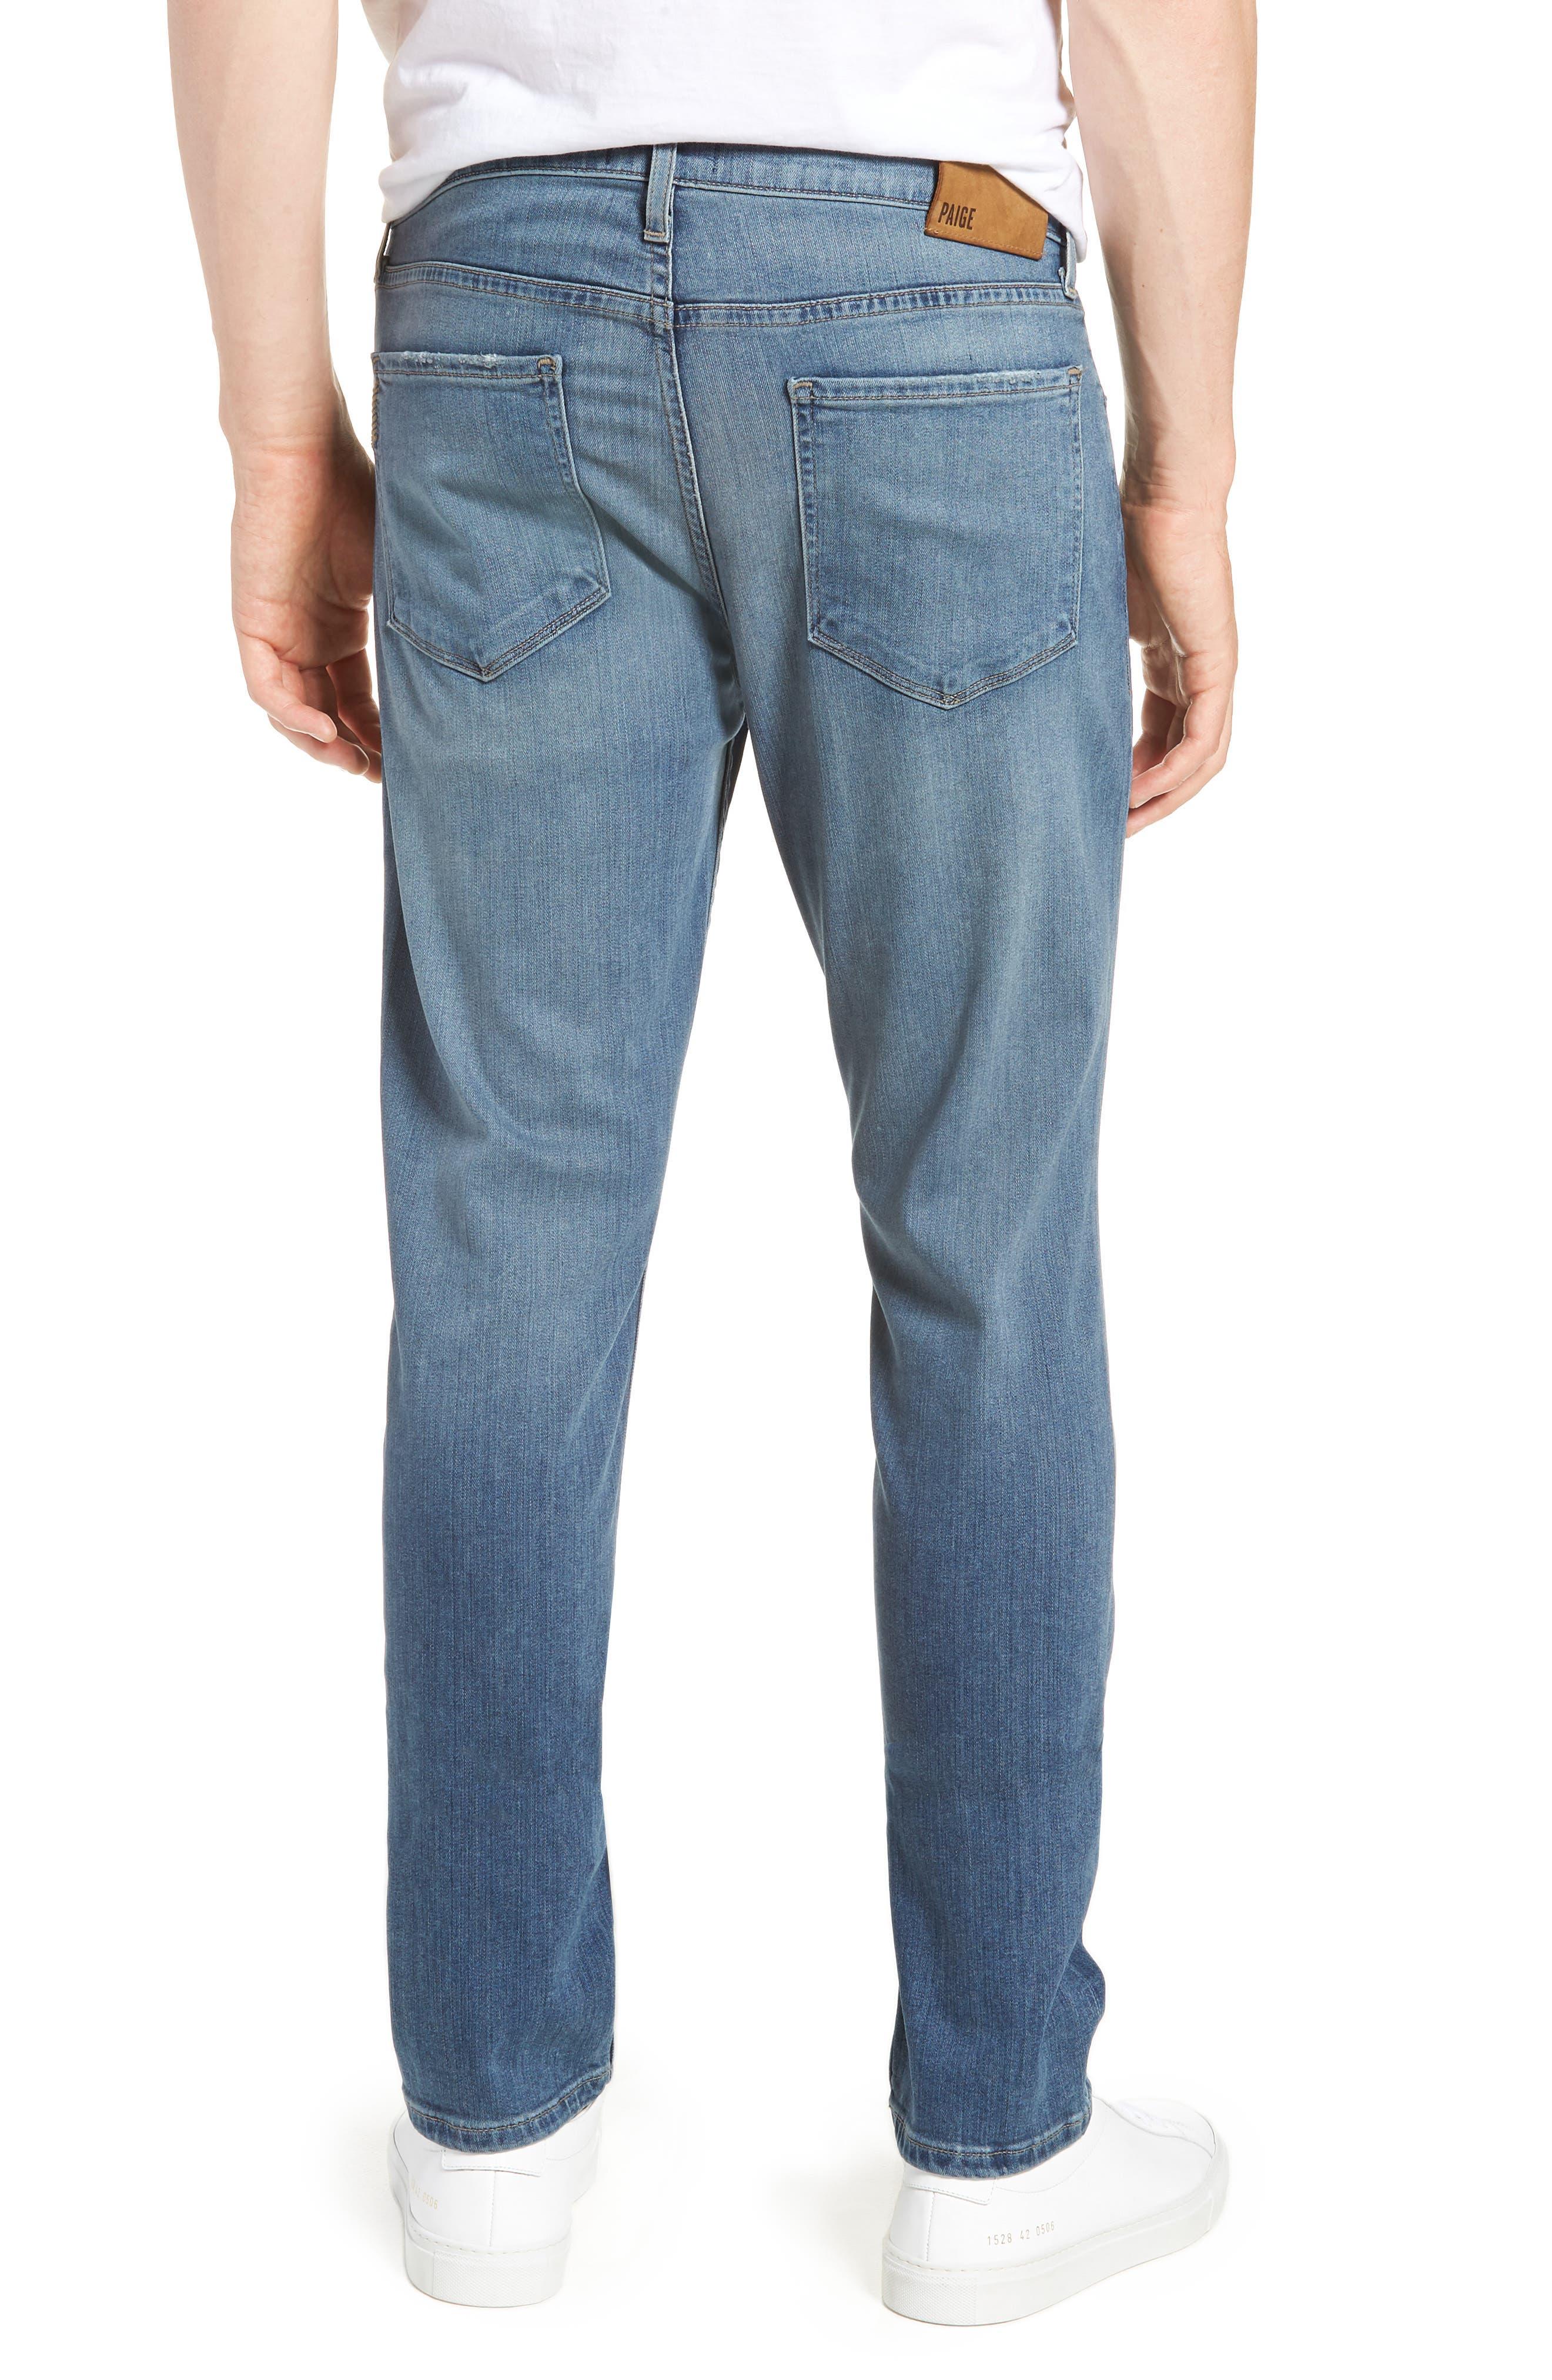 Transcend - Lennox Slim Fit Jeans,                             Alternate thumbnail 2, color,                             Allman